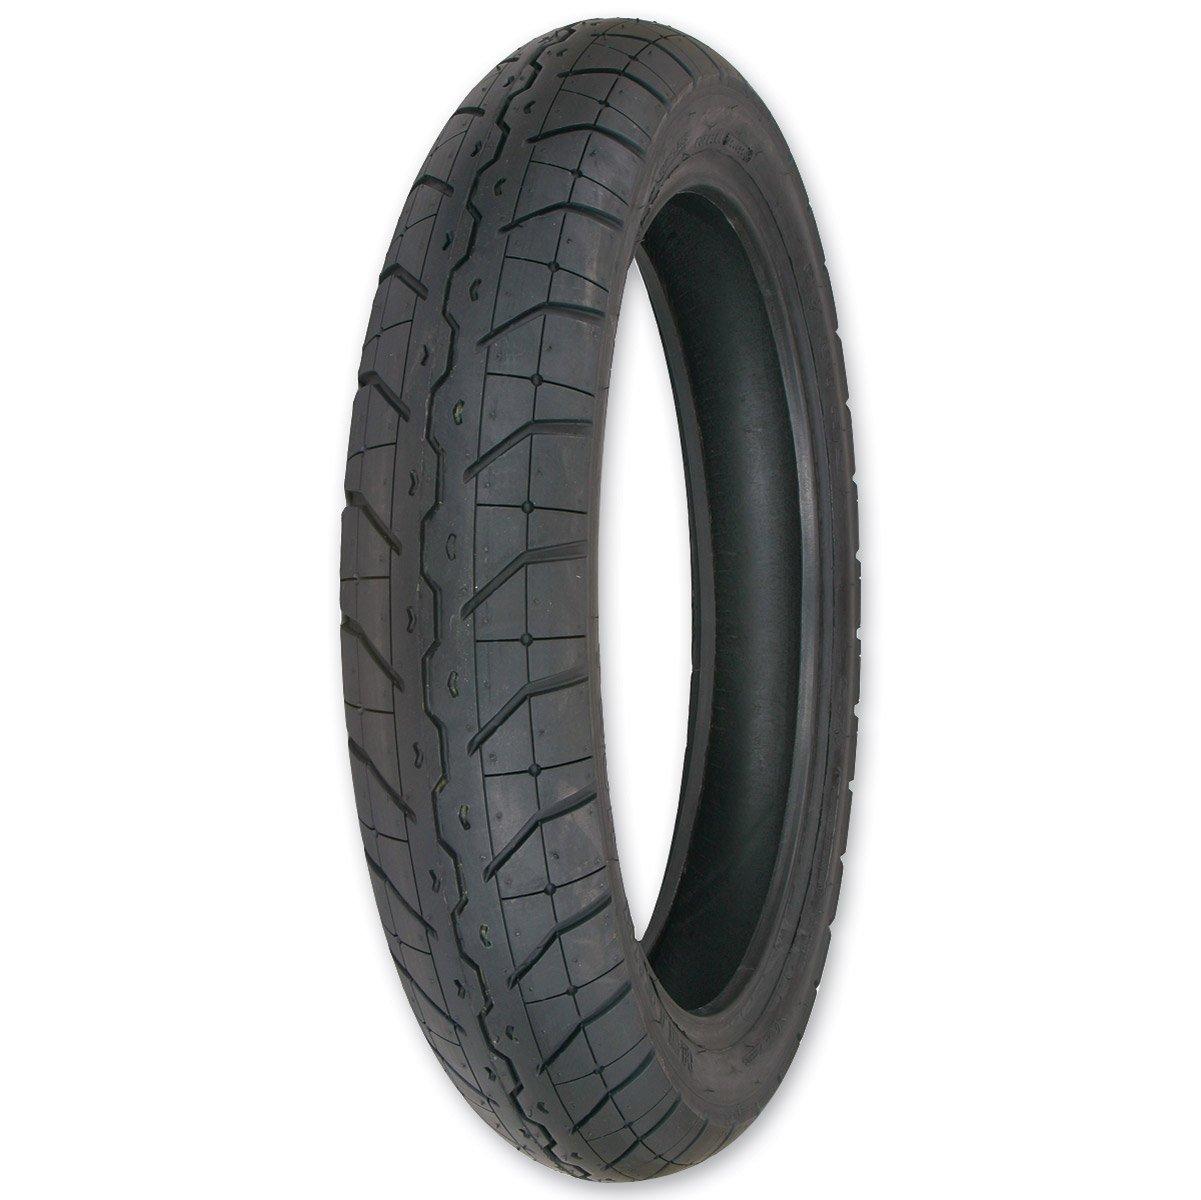 Shinko 230 Tour Master Front Tire (100/90-18) 4333047074 87-4160-MPR2